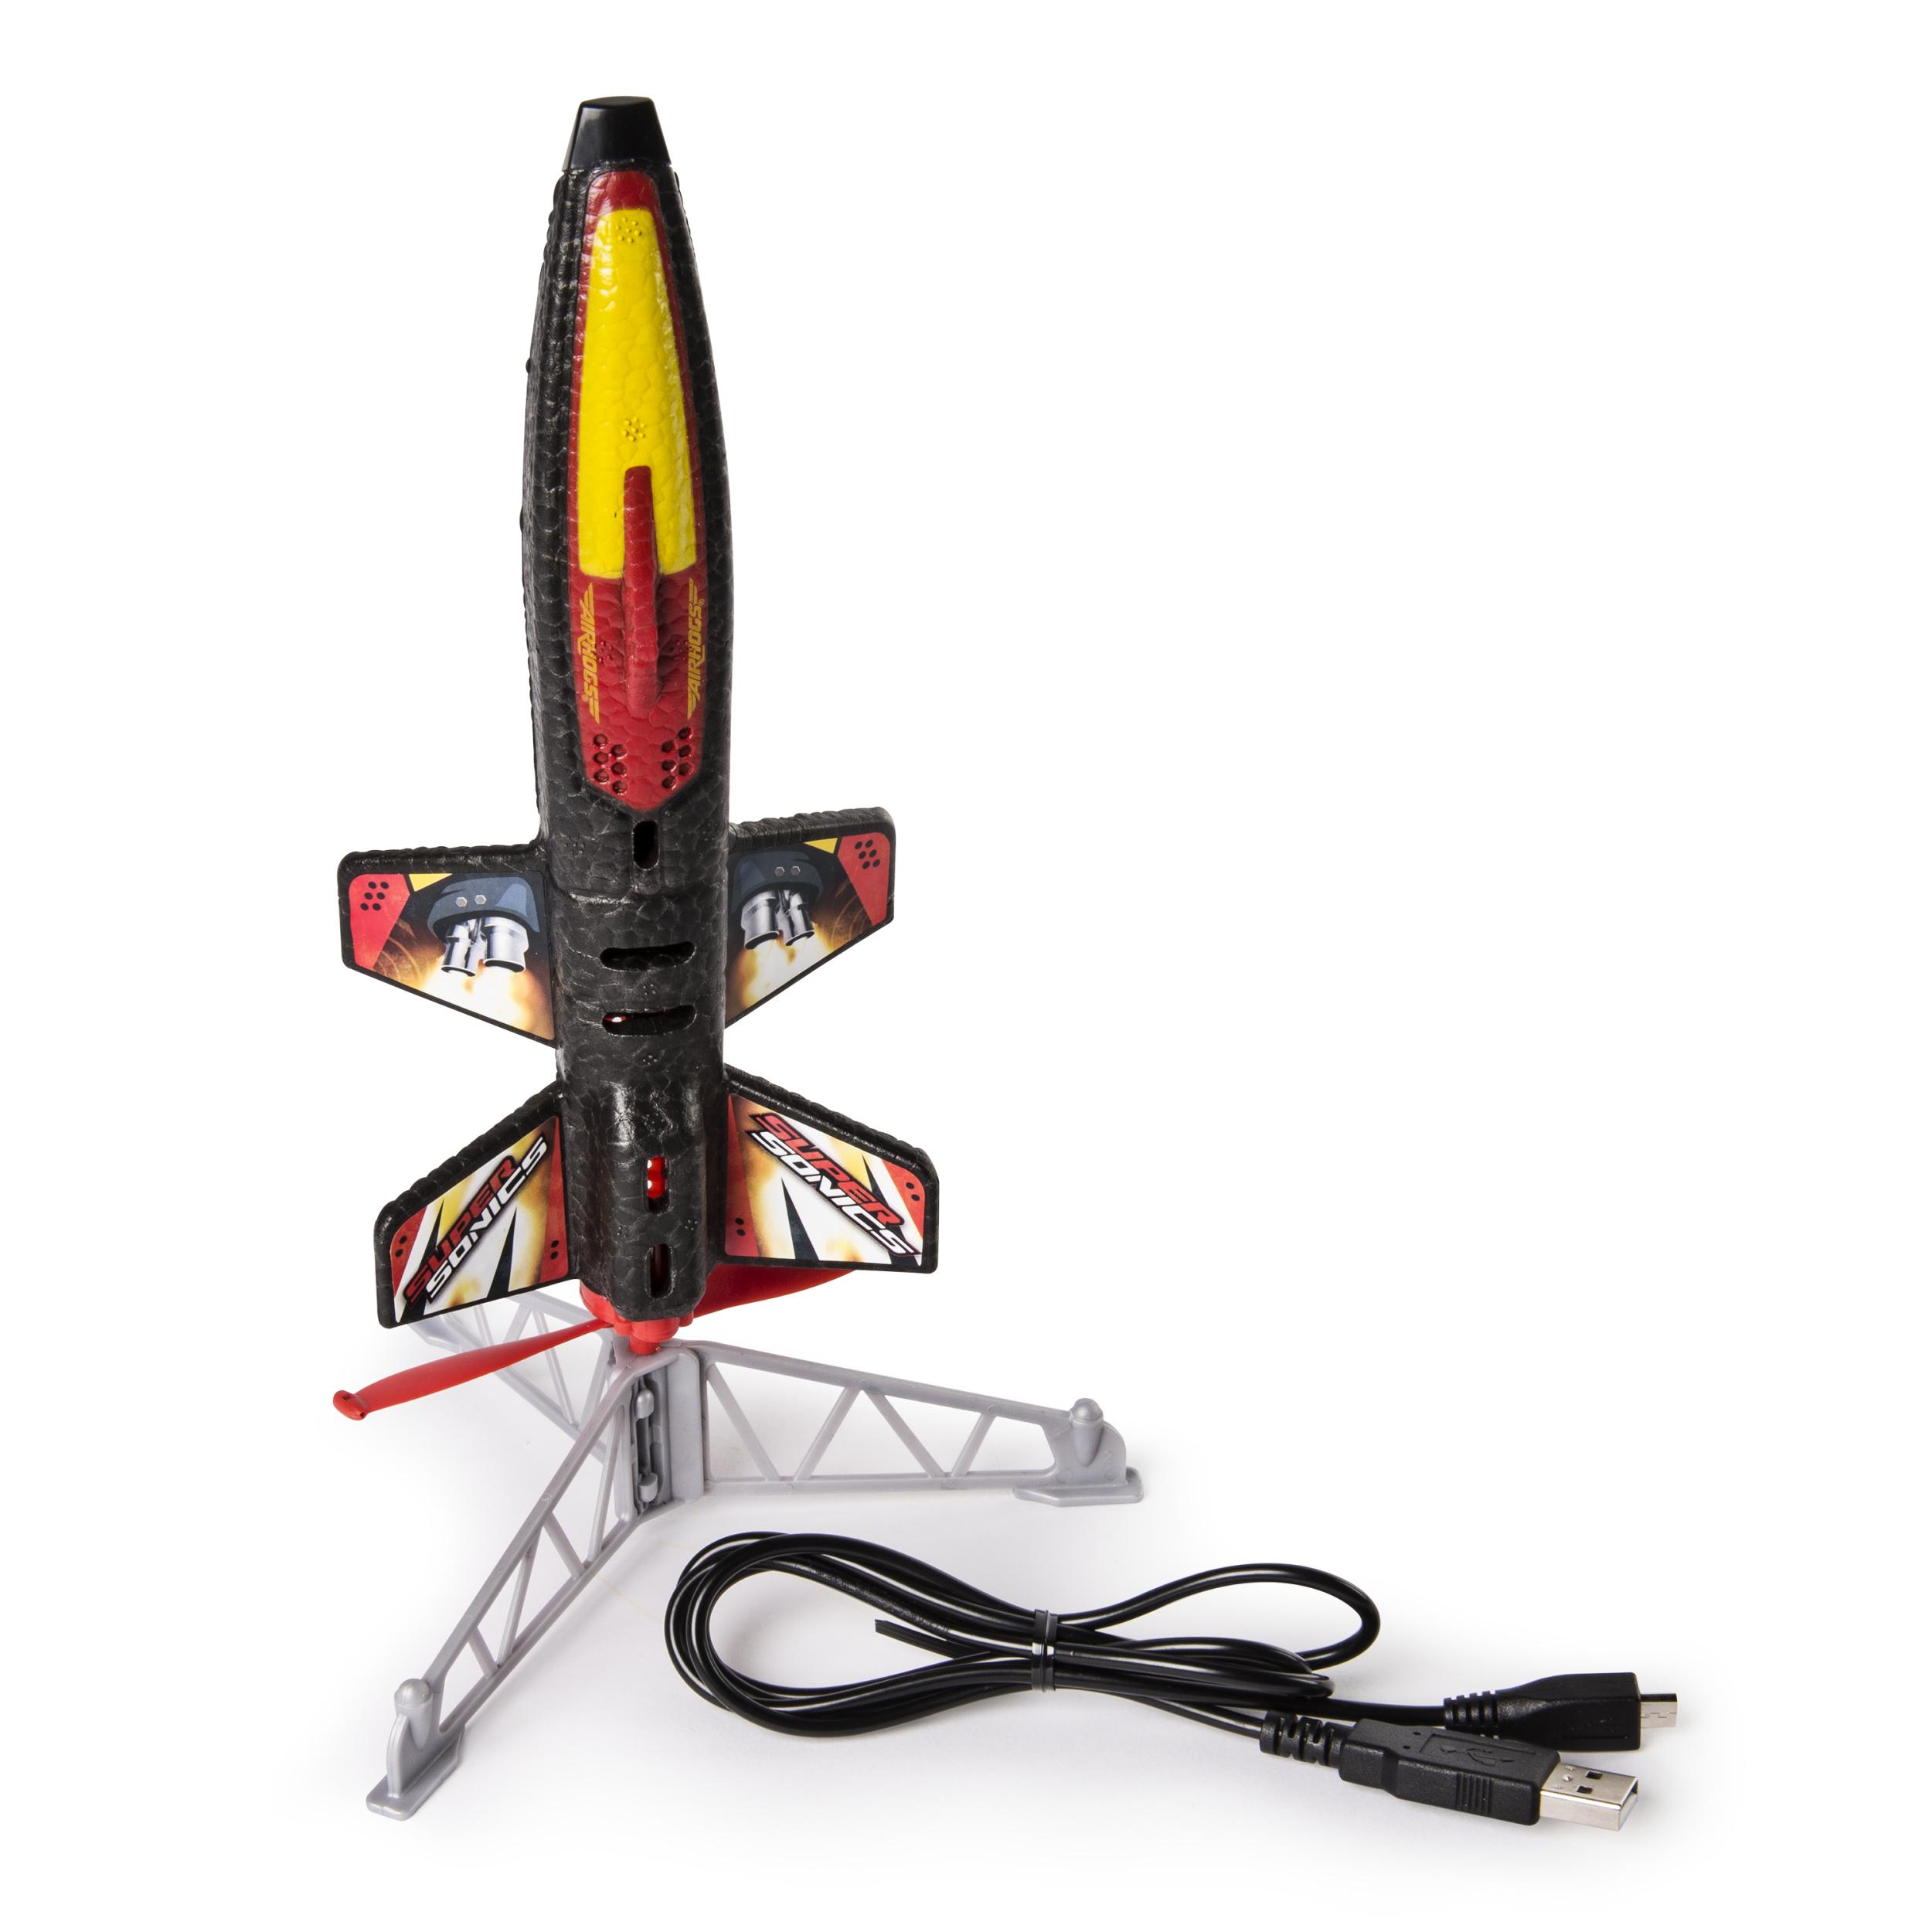 Air Hogs - Sonic Rocket High-flying Motorized Rocket